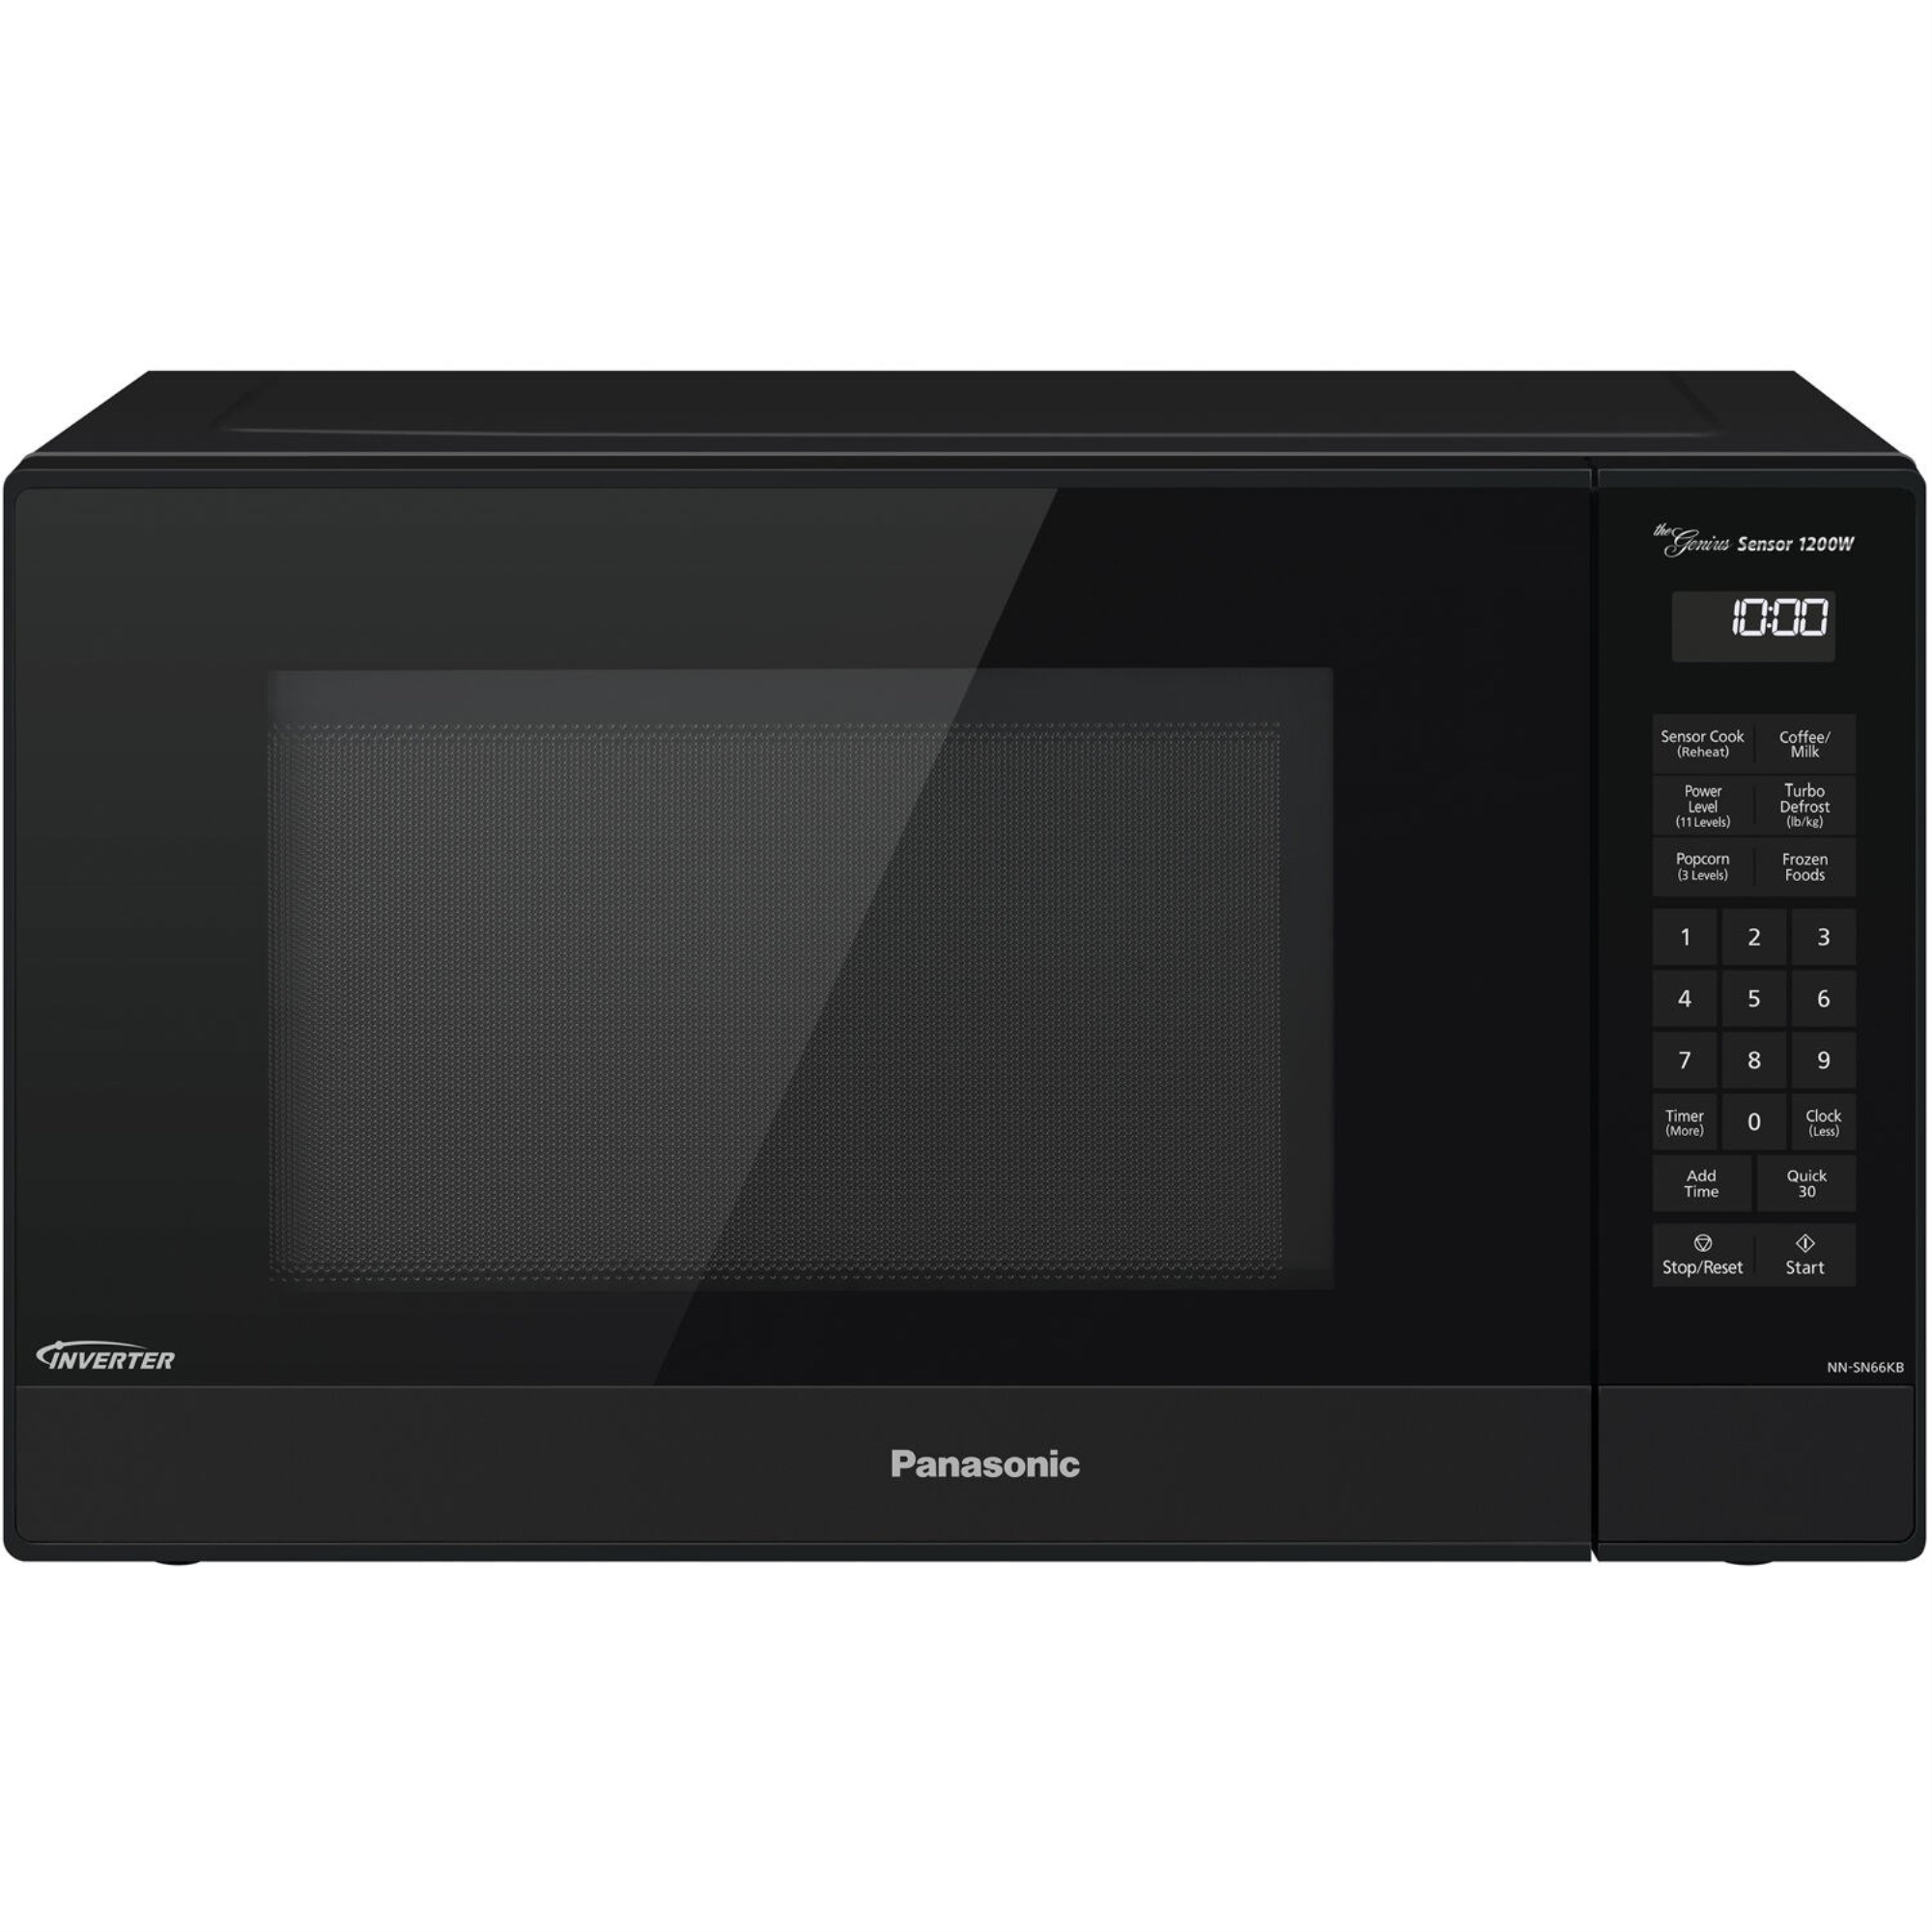 panasonic 1 2 cu ft 1200w genius sensor countertop microwave oven with inverter technology in black walmart com